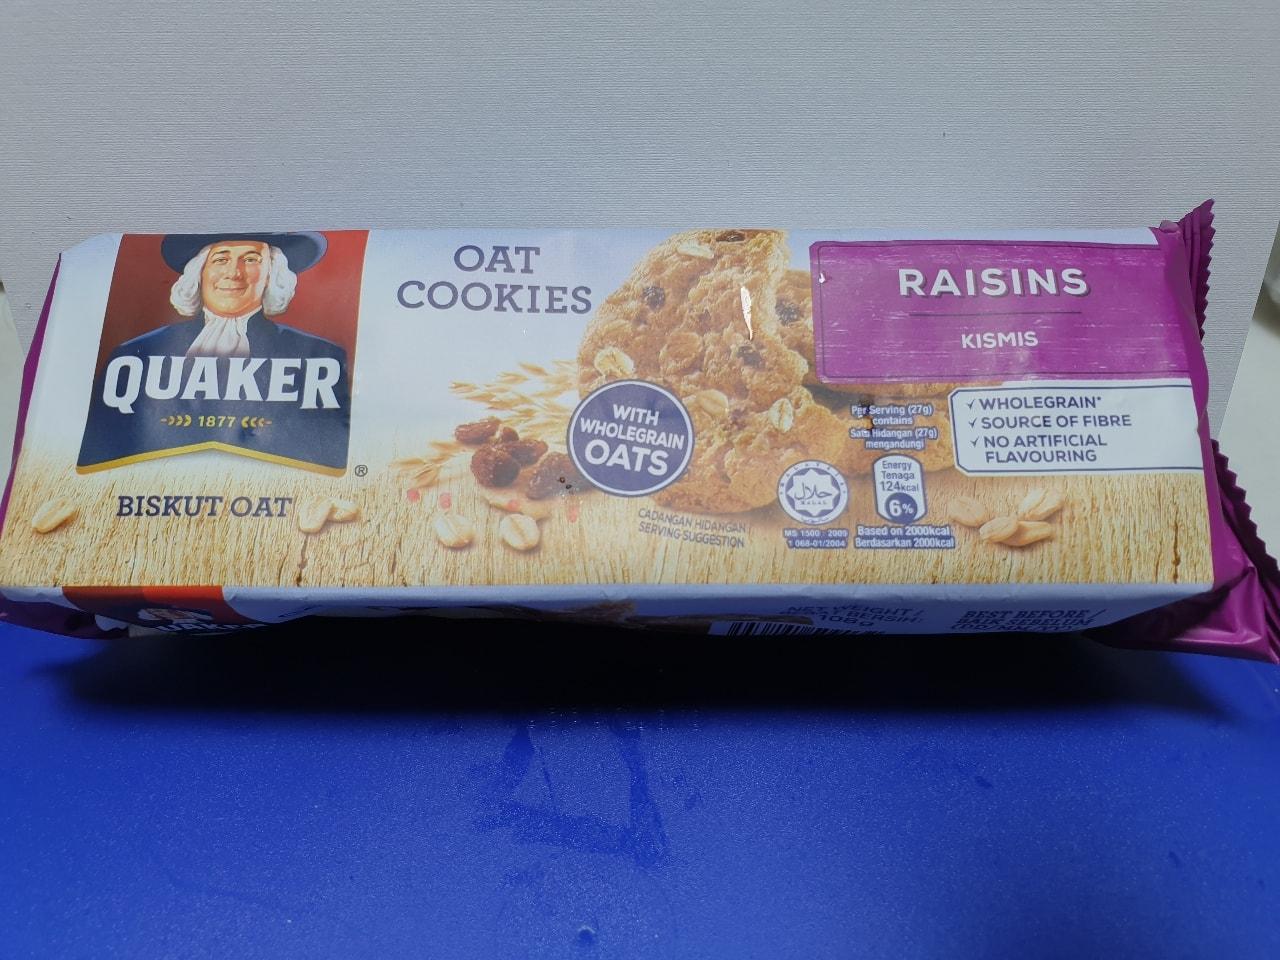 Quaker raisins oak cookies